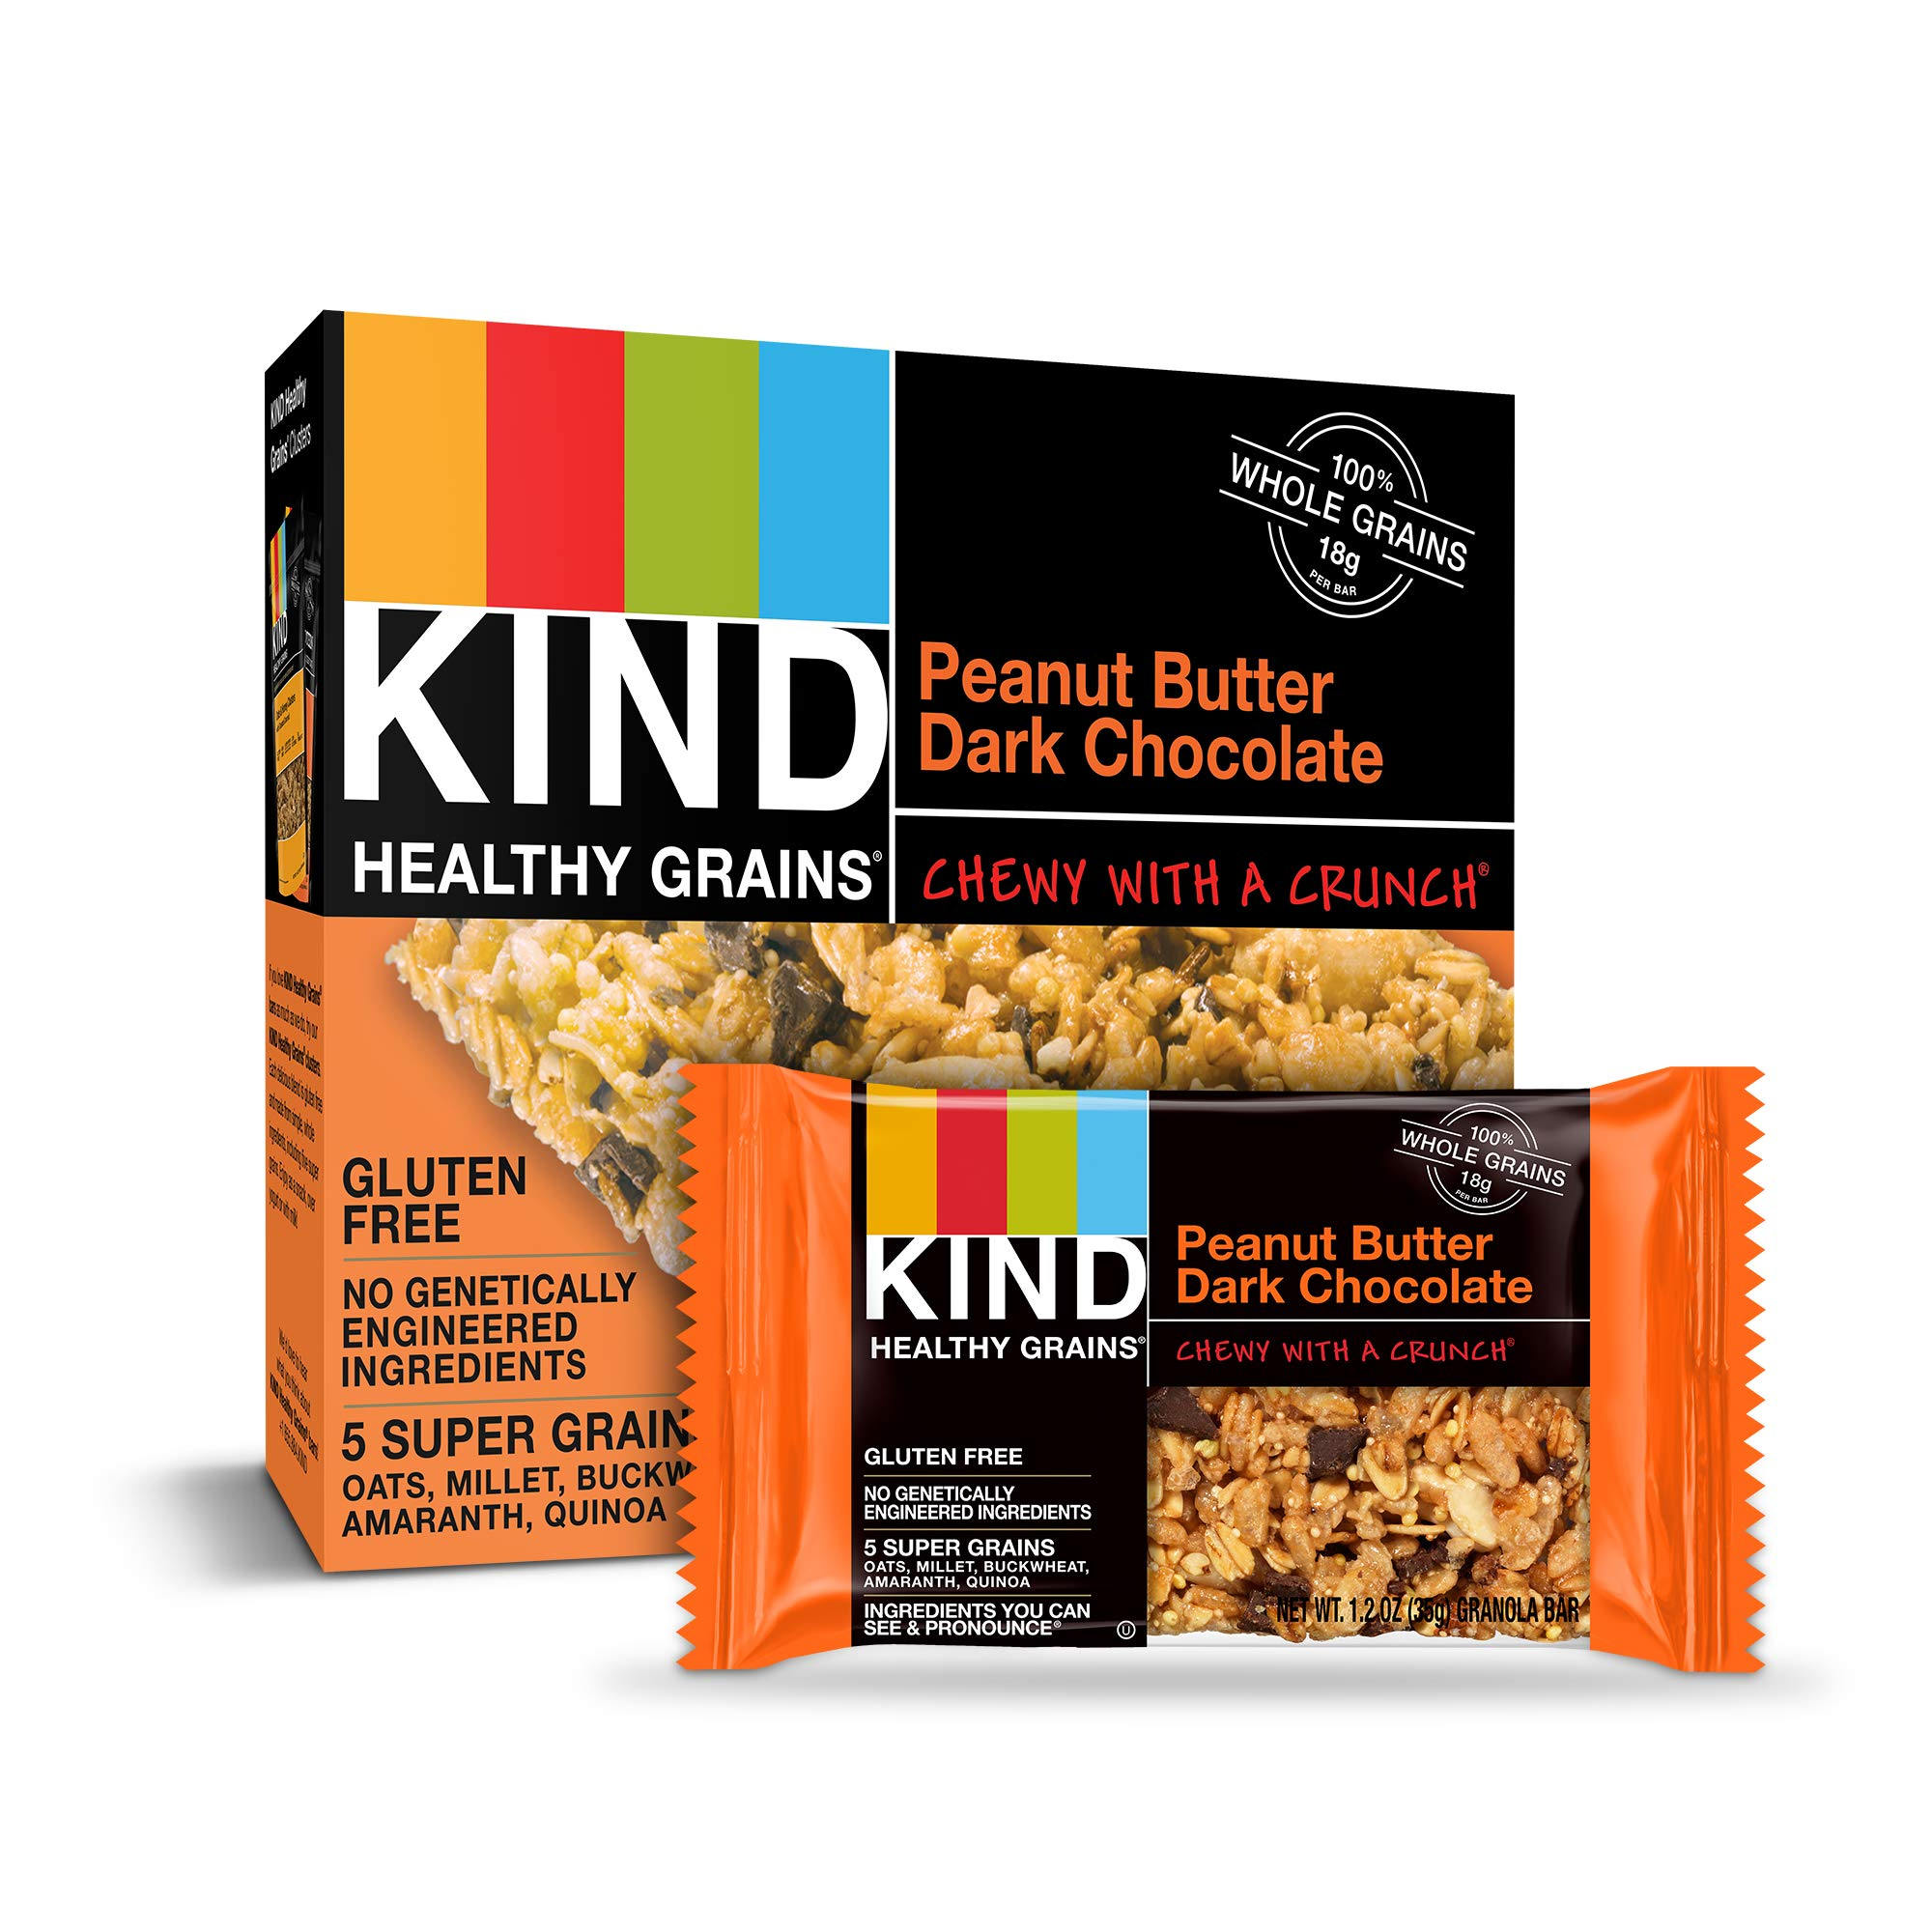 KIND Healthy Grains Granola Bars, Peanut Butter Dark Chocolate, Gluten Free, 1.2 oz, 30 Count